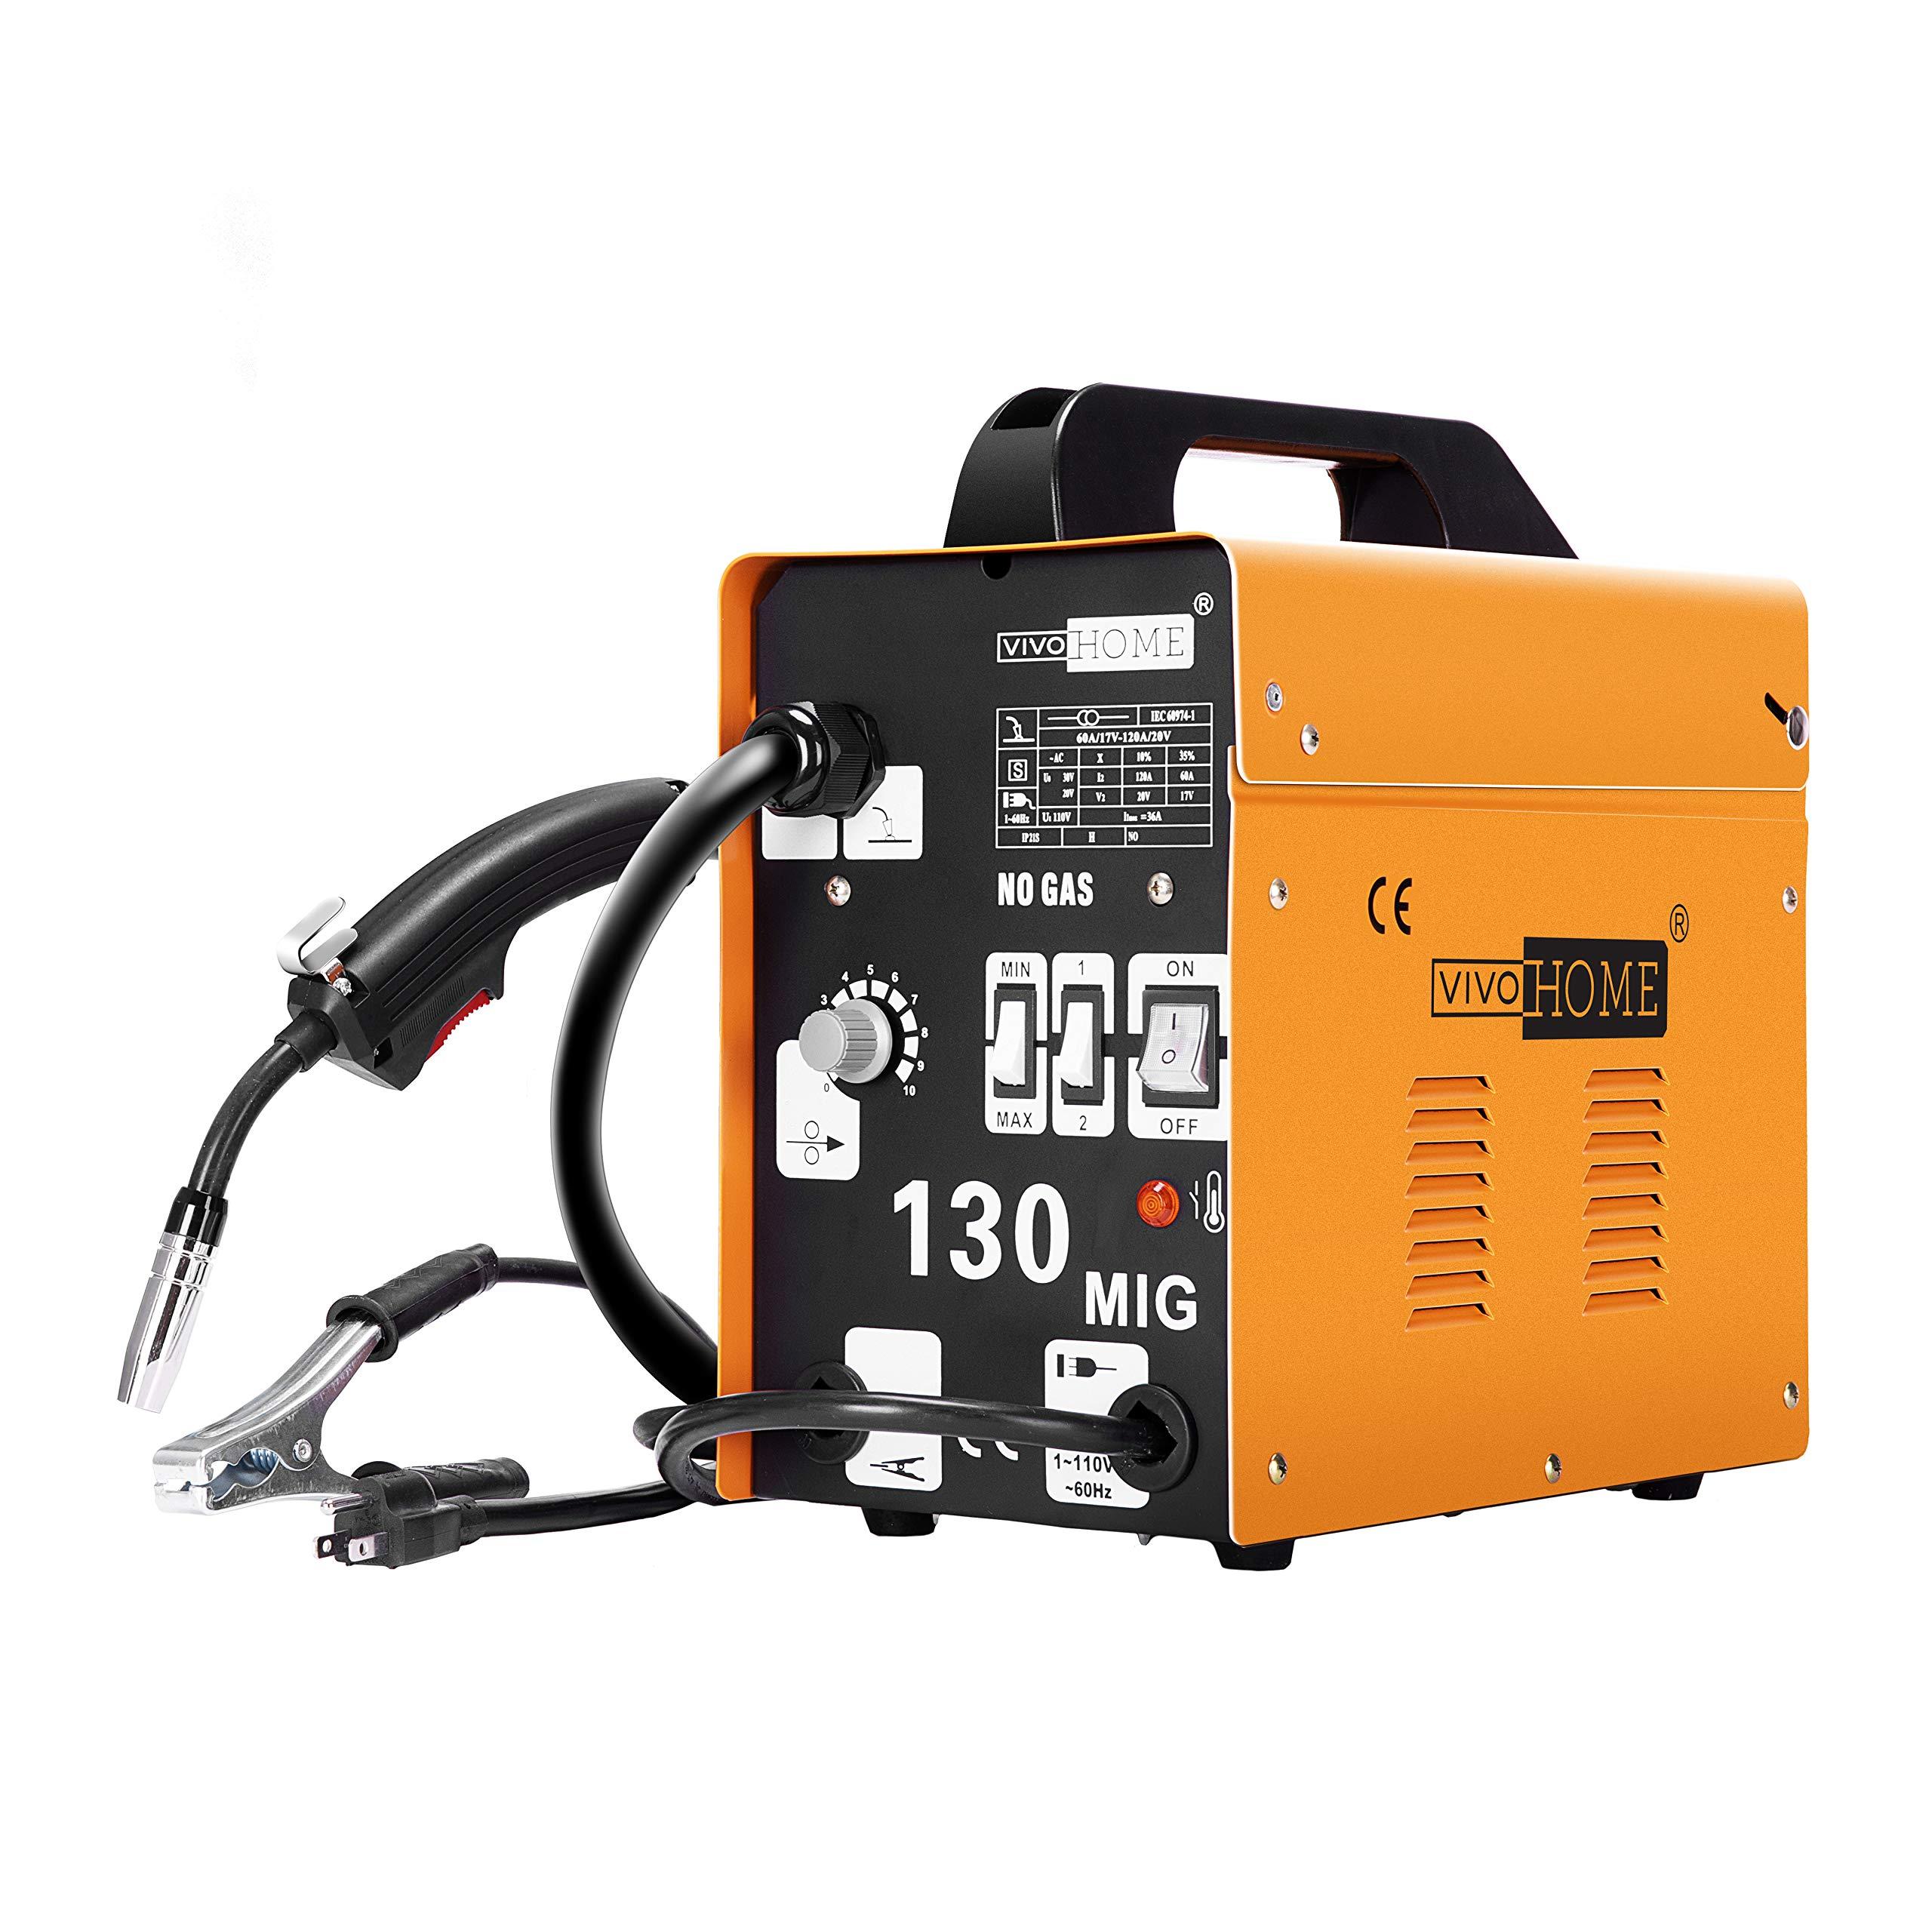 VIVOHOME Portable Flux Core Wire No Gas MIG 130 Welder Machine 110V Yellow by VIVOHOME